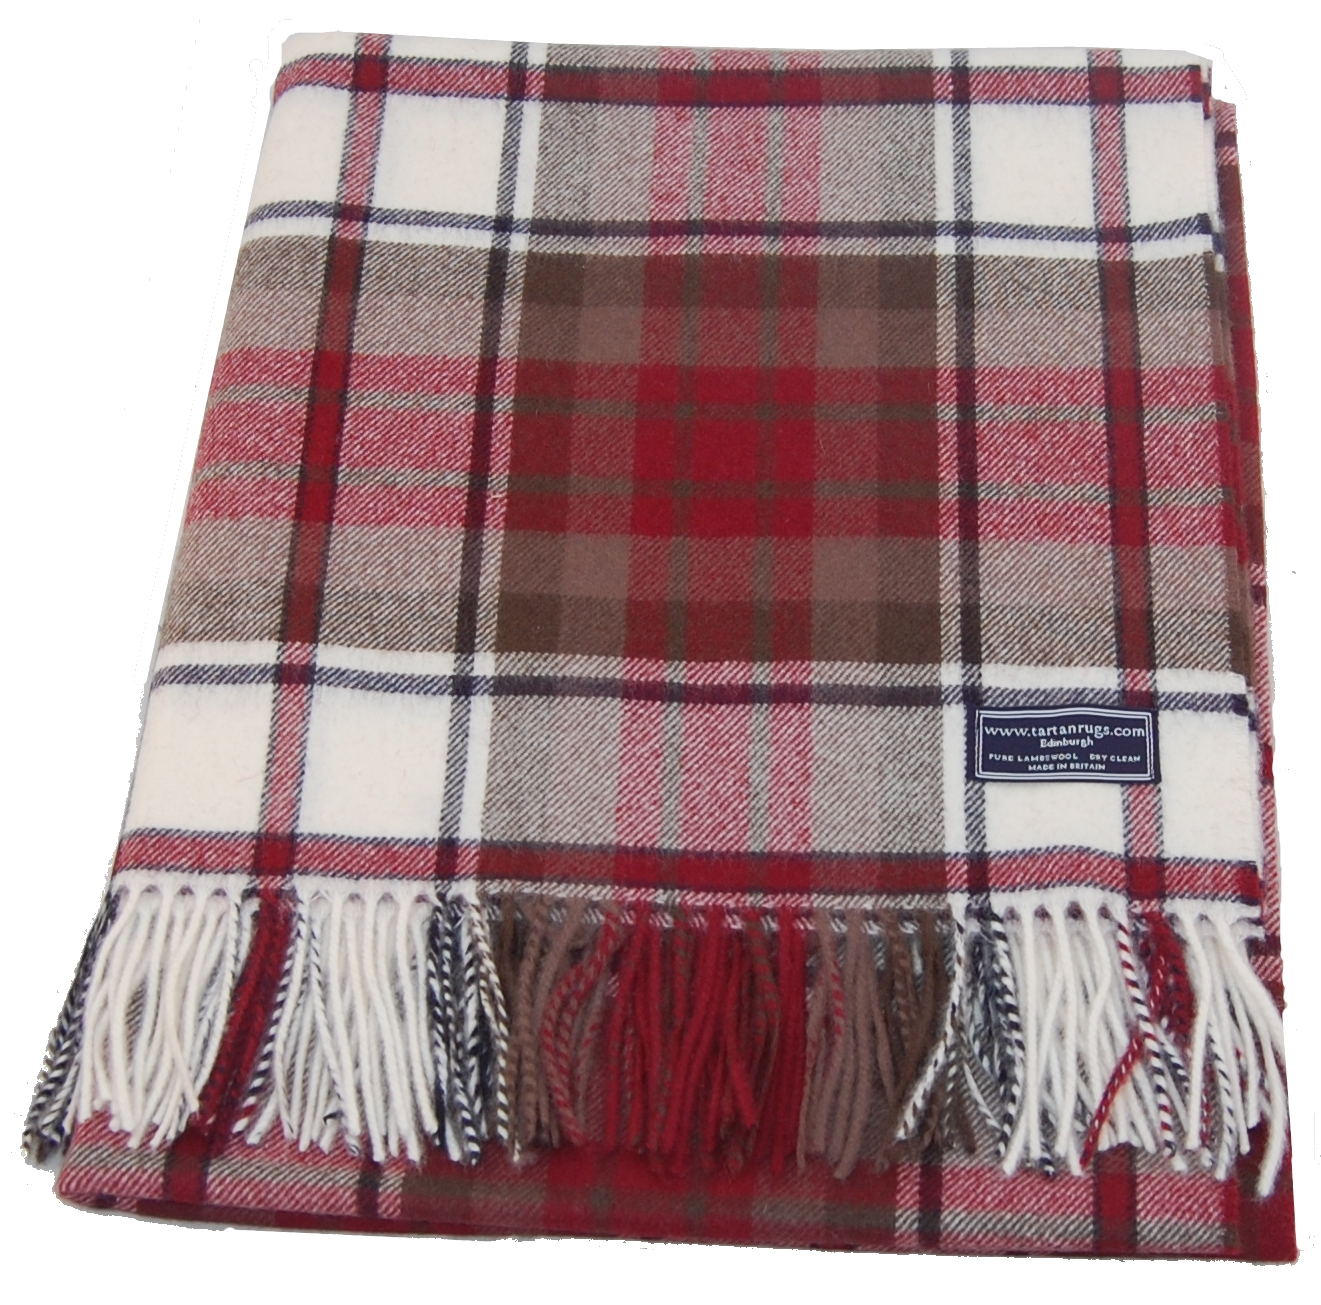 Dress Macduff Tartan Lambswool Travel Rug